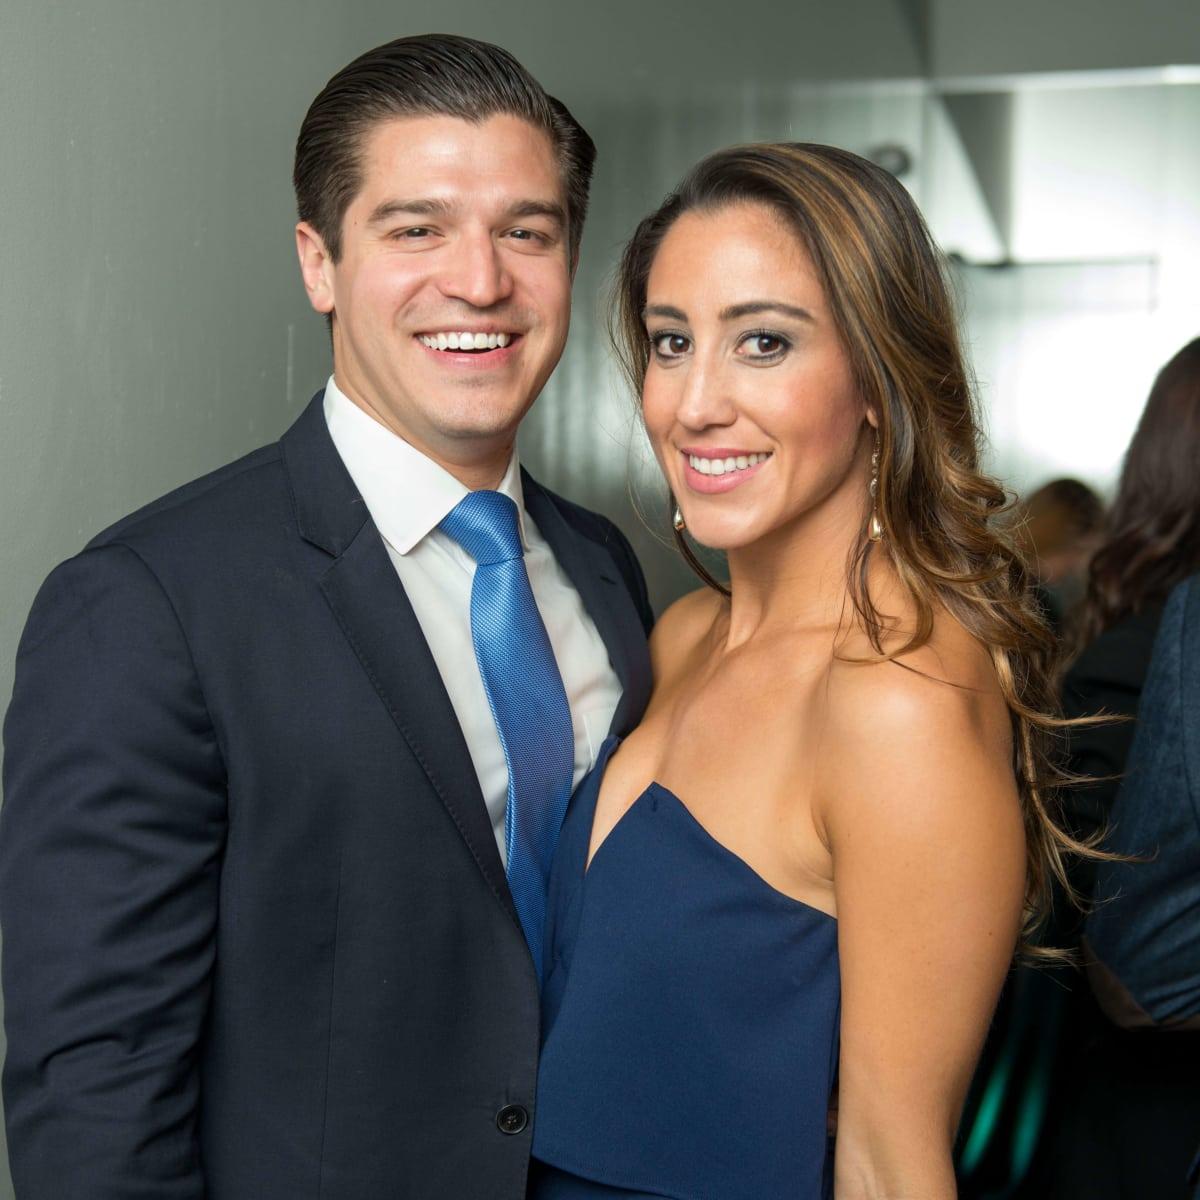 Houston, RYDE/Rose Foundation event, Oct. 2016, Ray Garcia, Lisi Karris